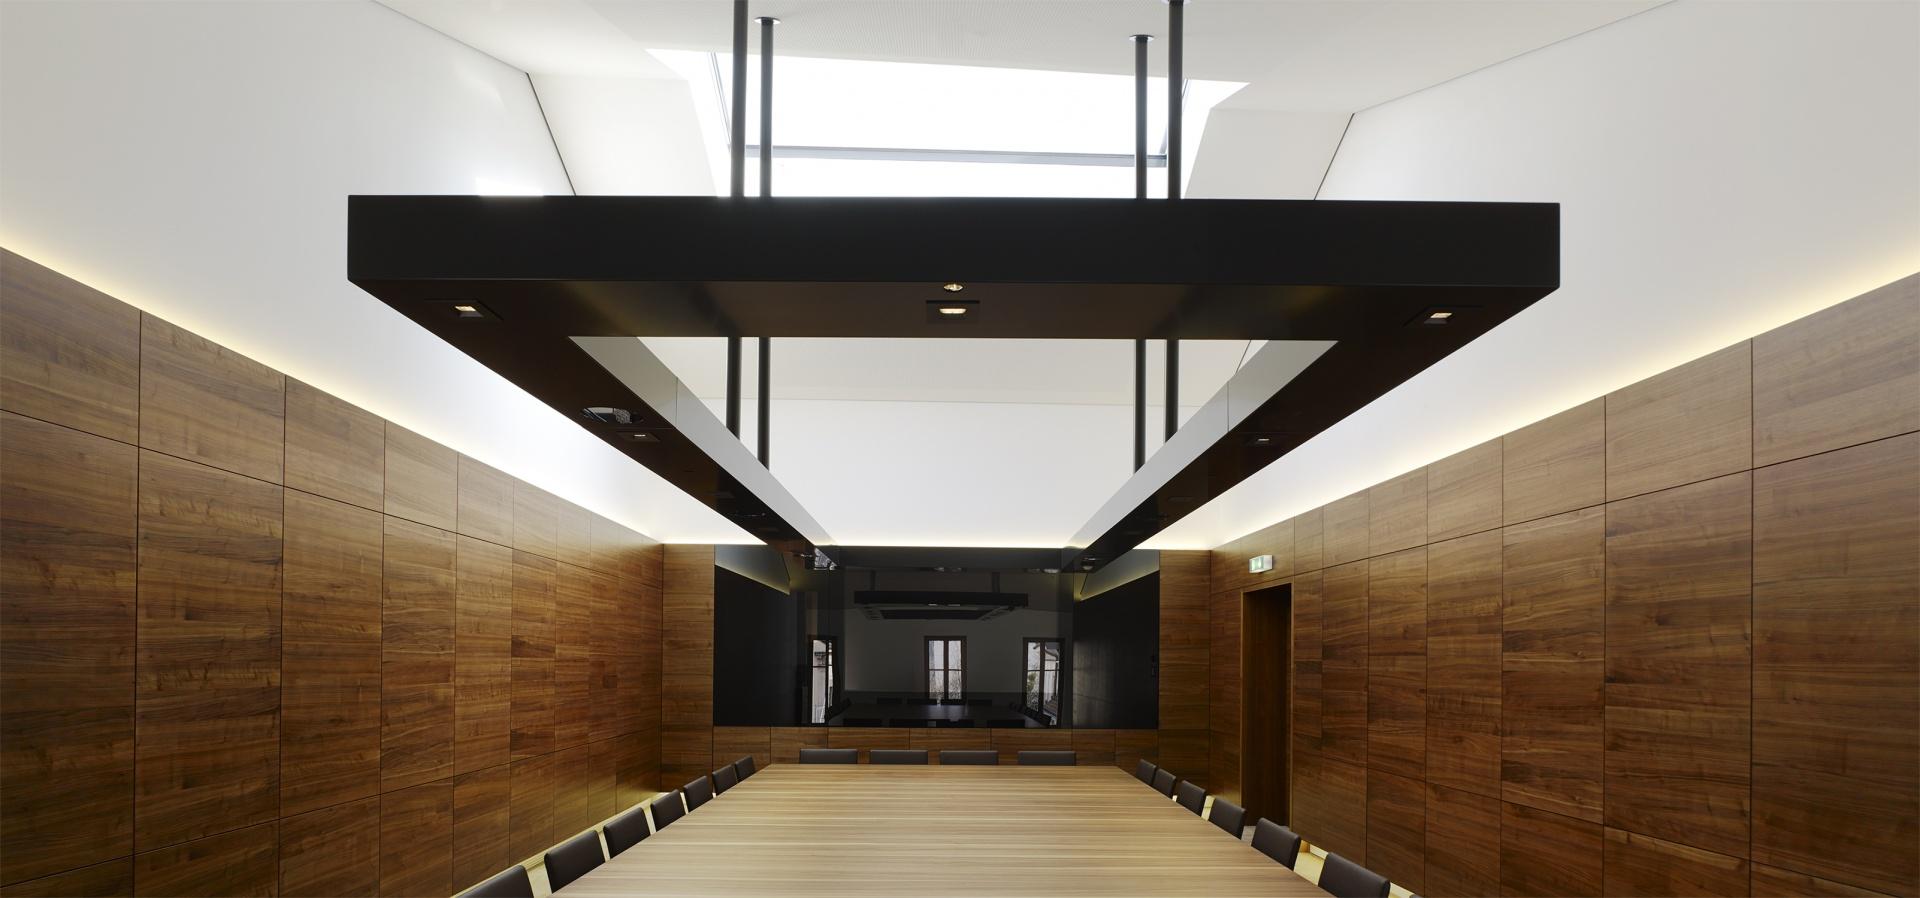 Konferenzraum © John MacLean, London